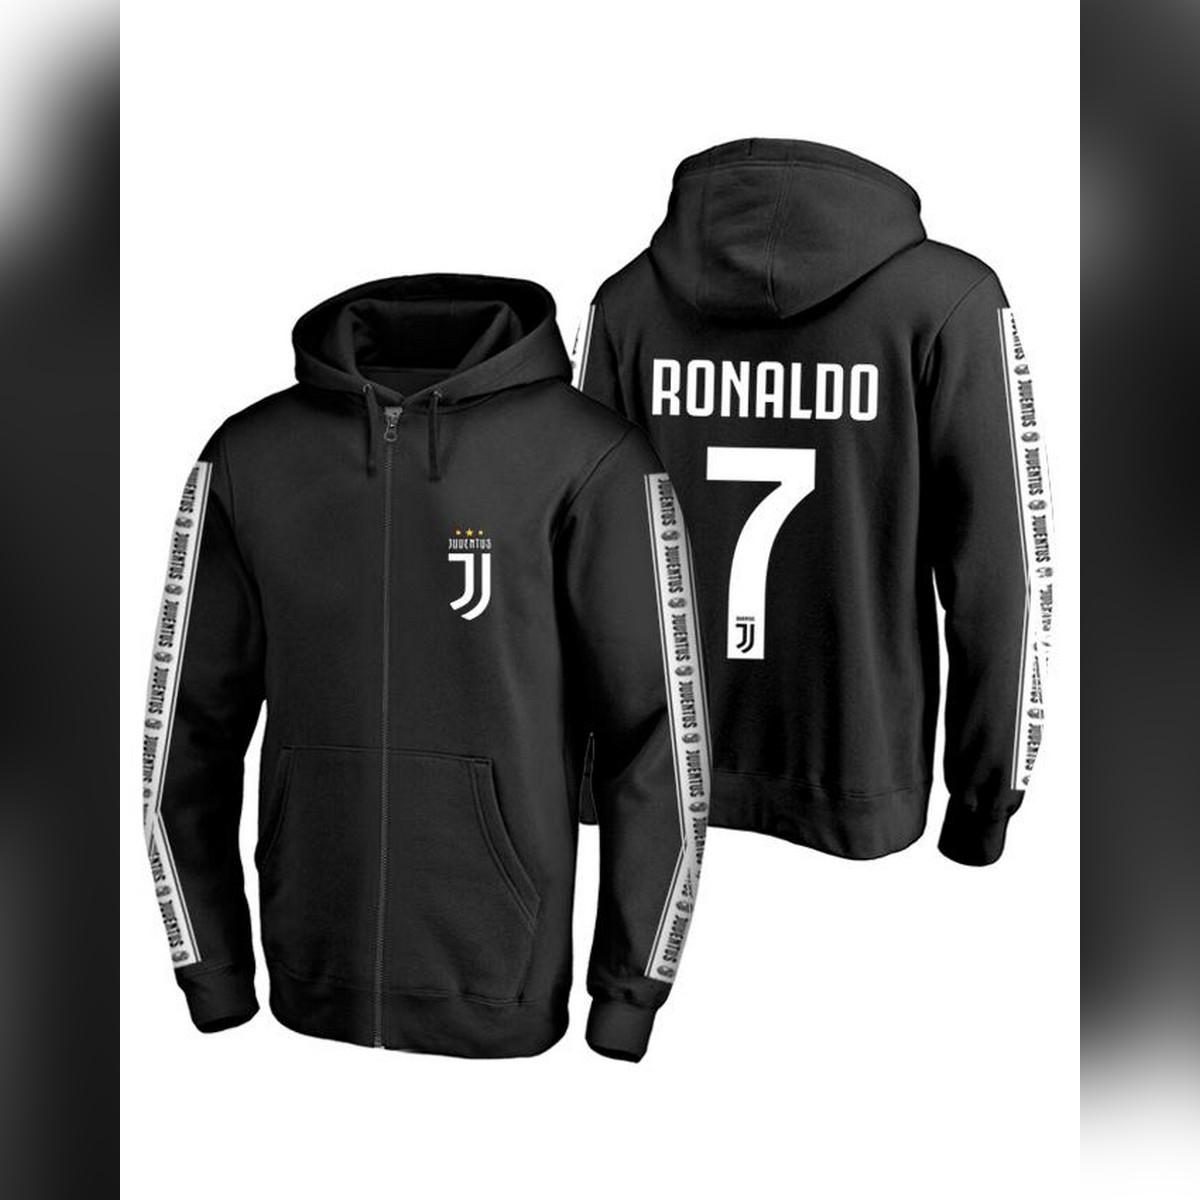 Ace - Ronaldo 7 Number Juventus Tape Sleeves Hoodie 2019 for Him